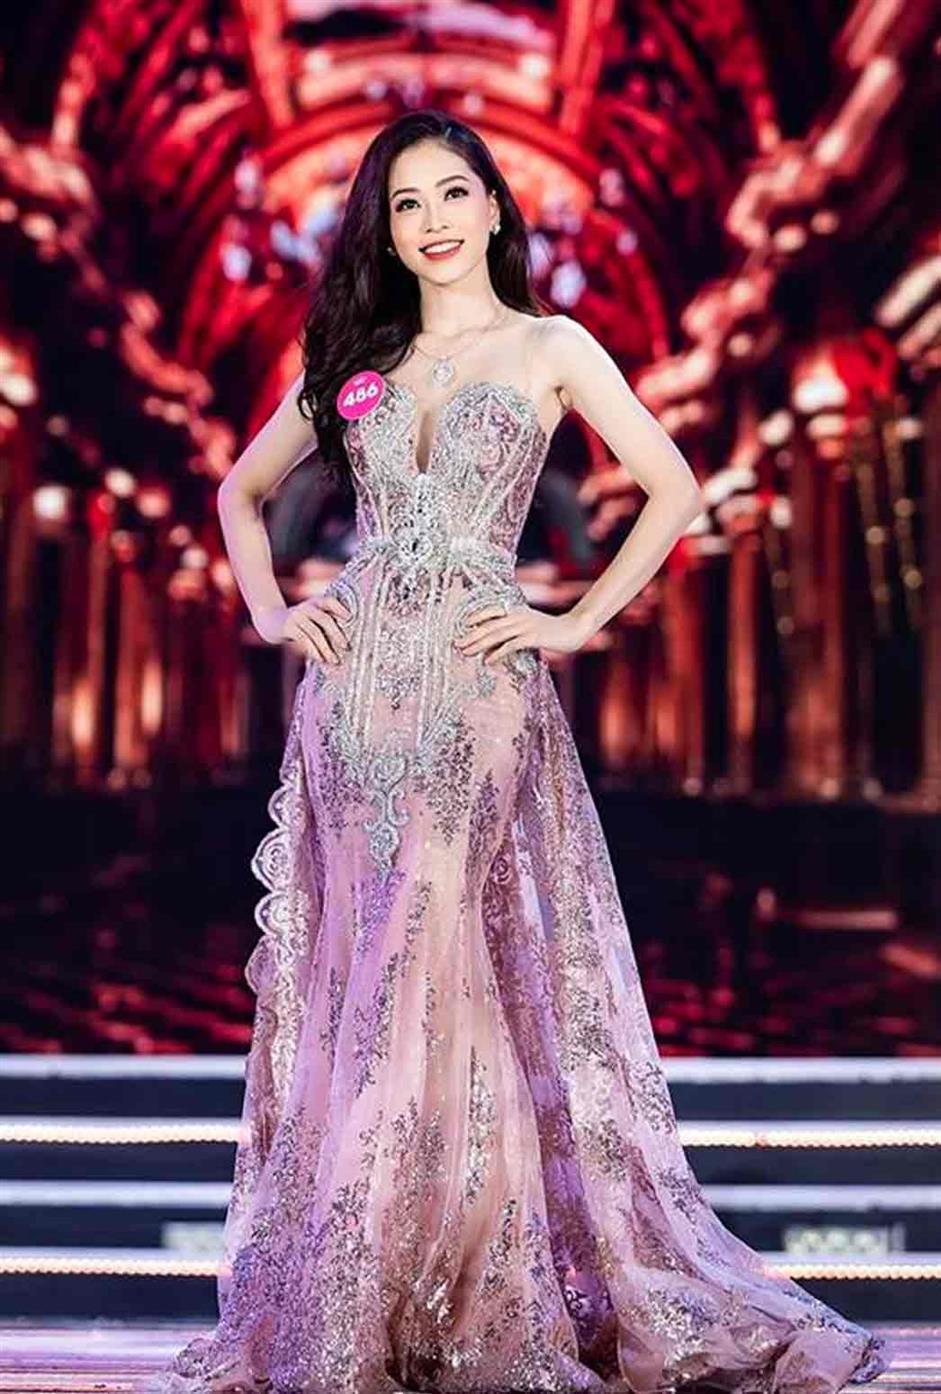 Bui Phuong Nga represented Vietnam at Miss Grand International 2018